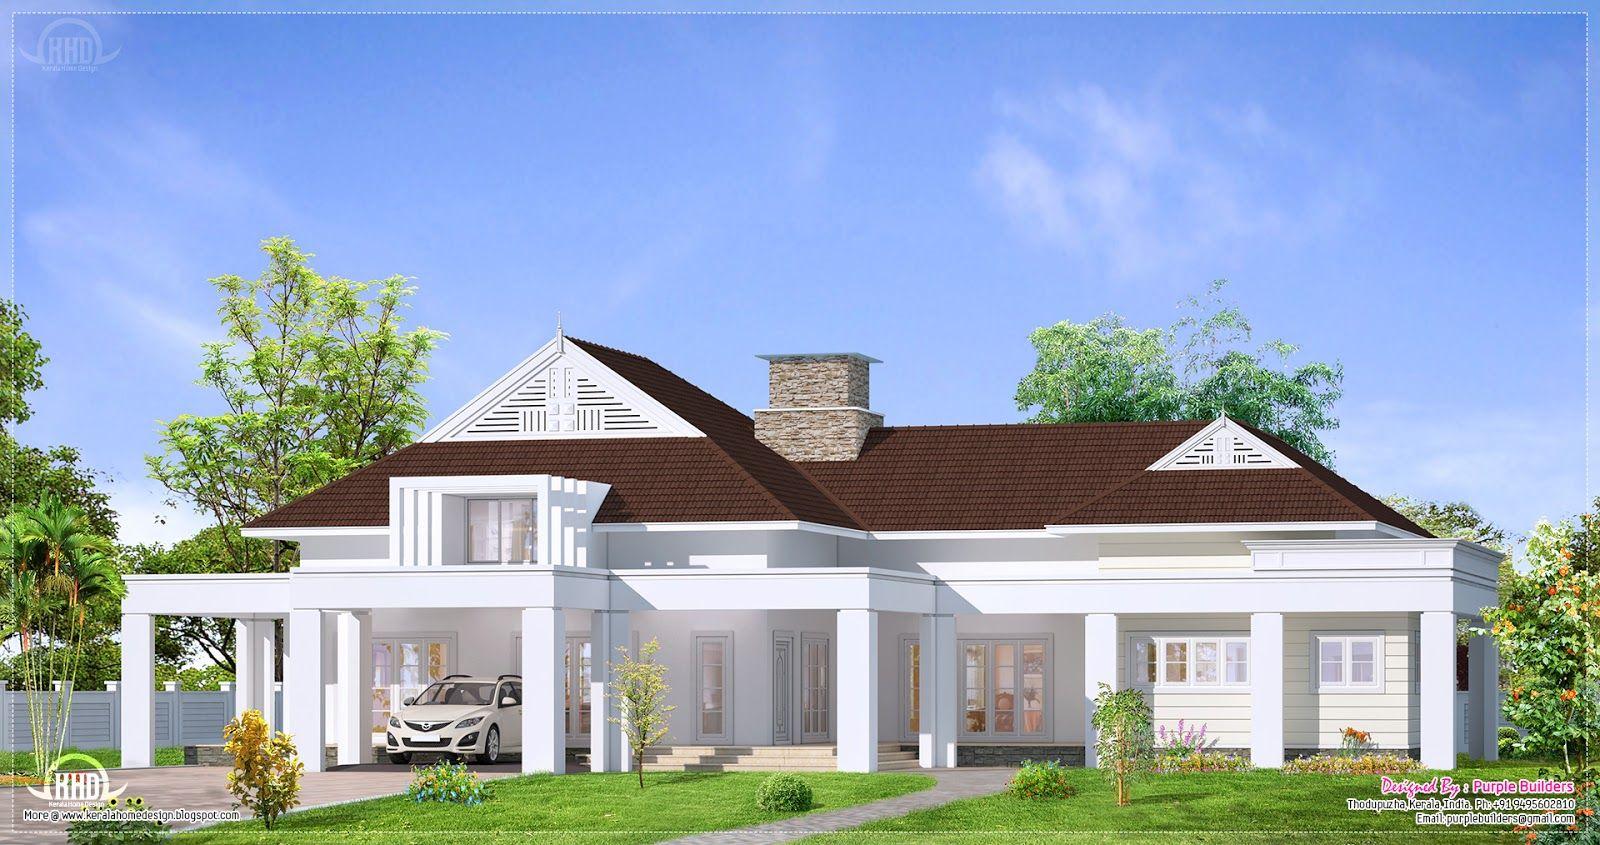 bungalow house plans to impress bungalow house plans